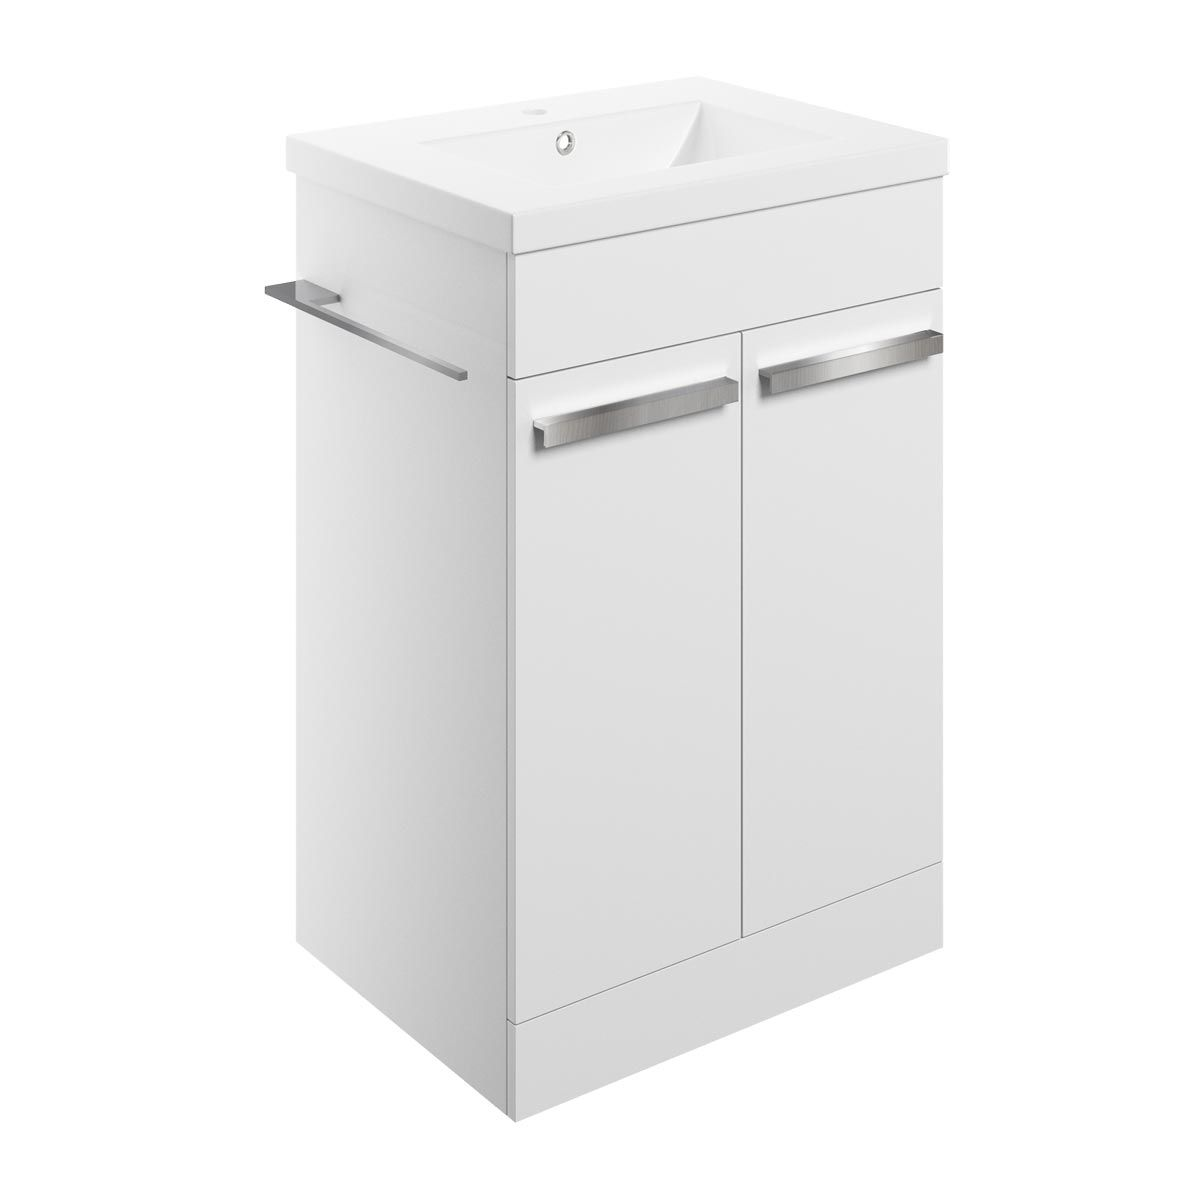 BTL Morina White Gloss Floor Vanity Unit with Basin 615mm